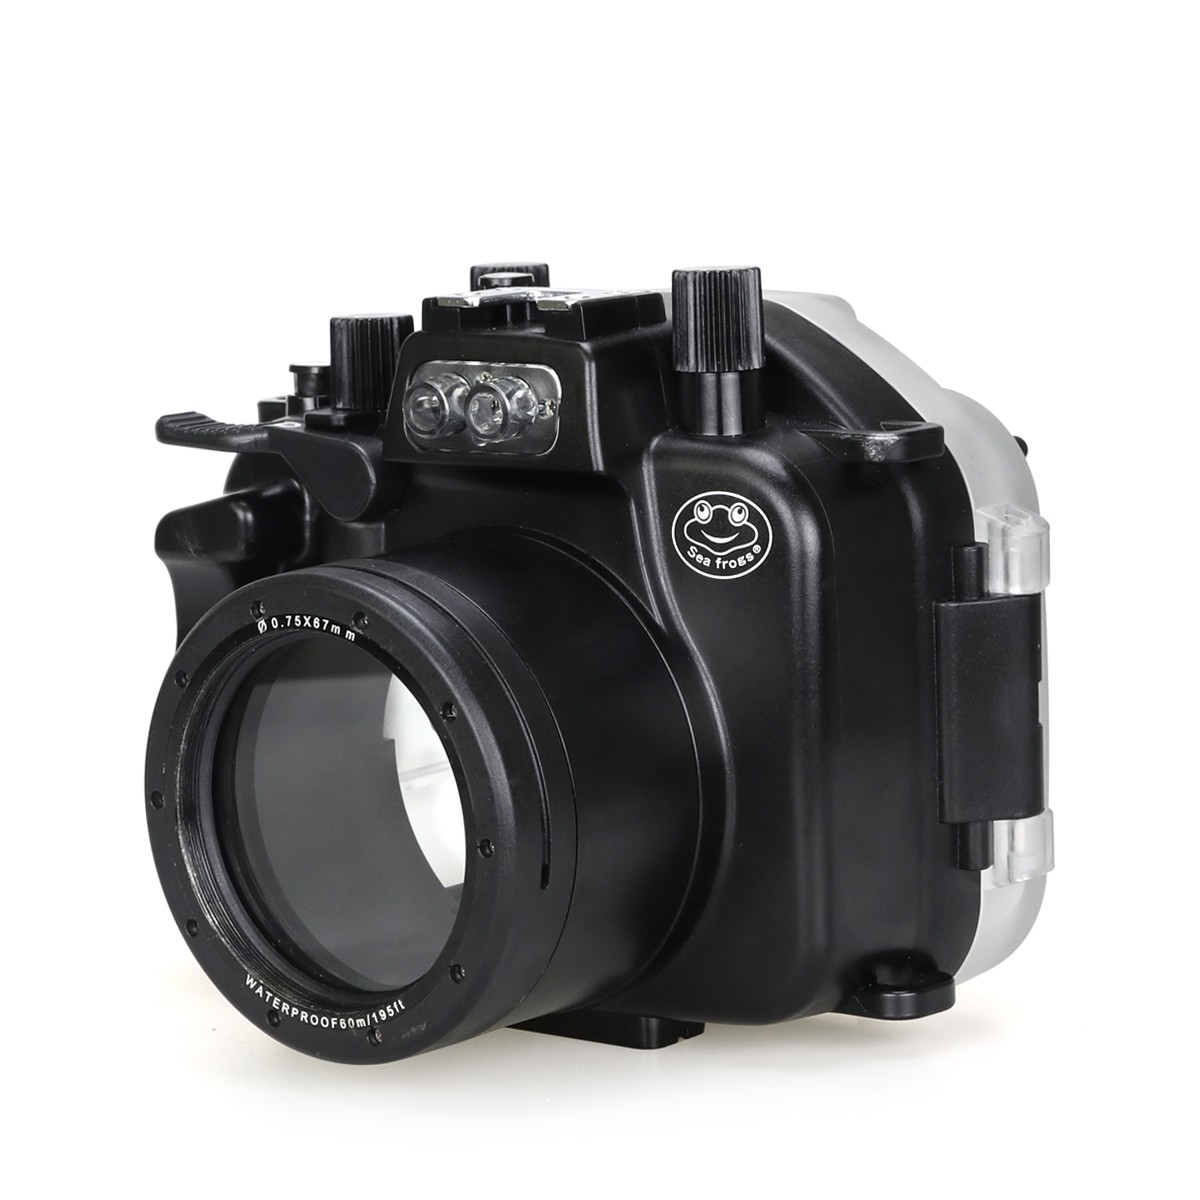 Meikon 40m/130ft Underwater Camera Housing For Canon EOS M5 18-55mm Lens meikon 40m waterproof underwater housing case for canon eos m 18 55mm